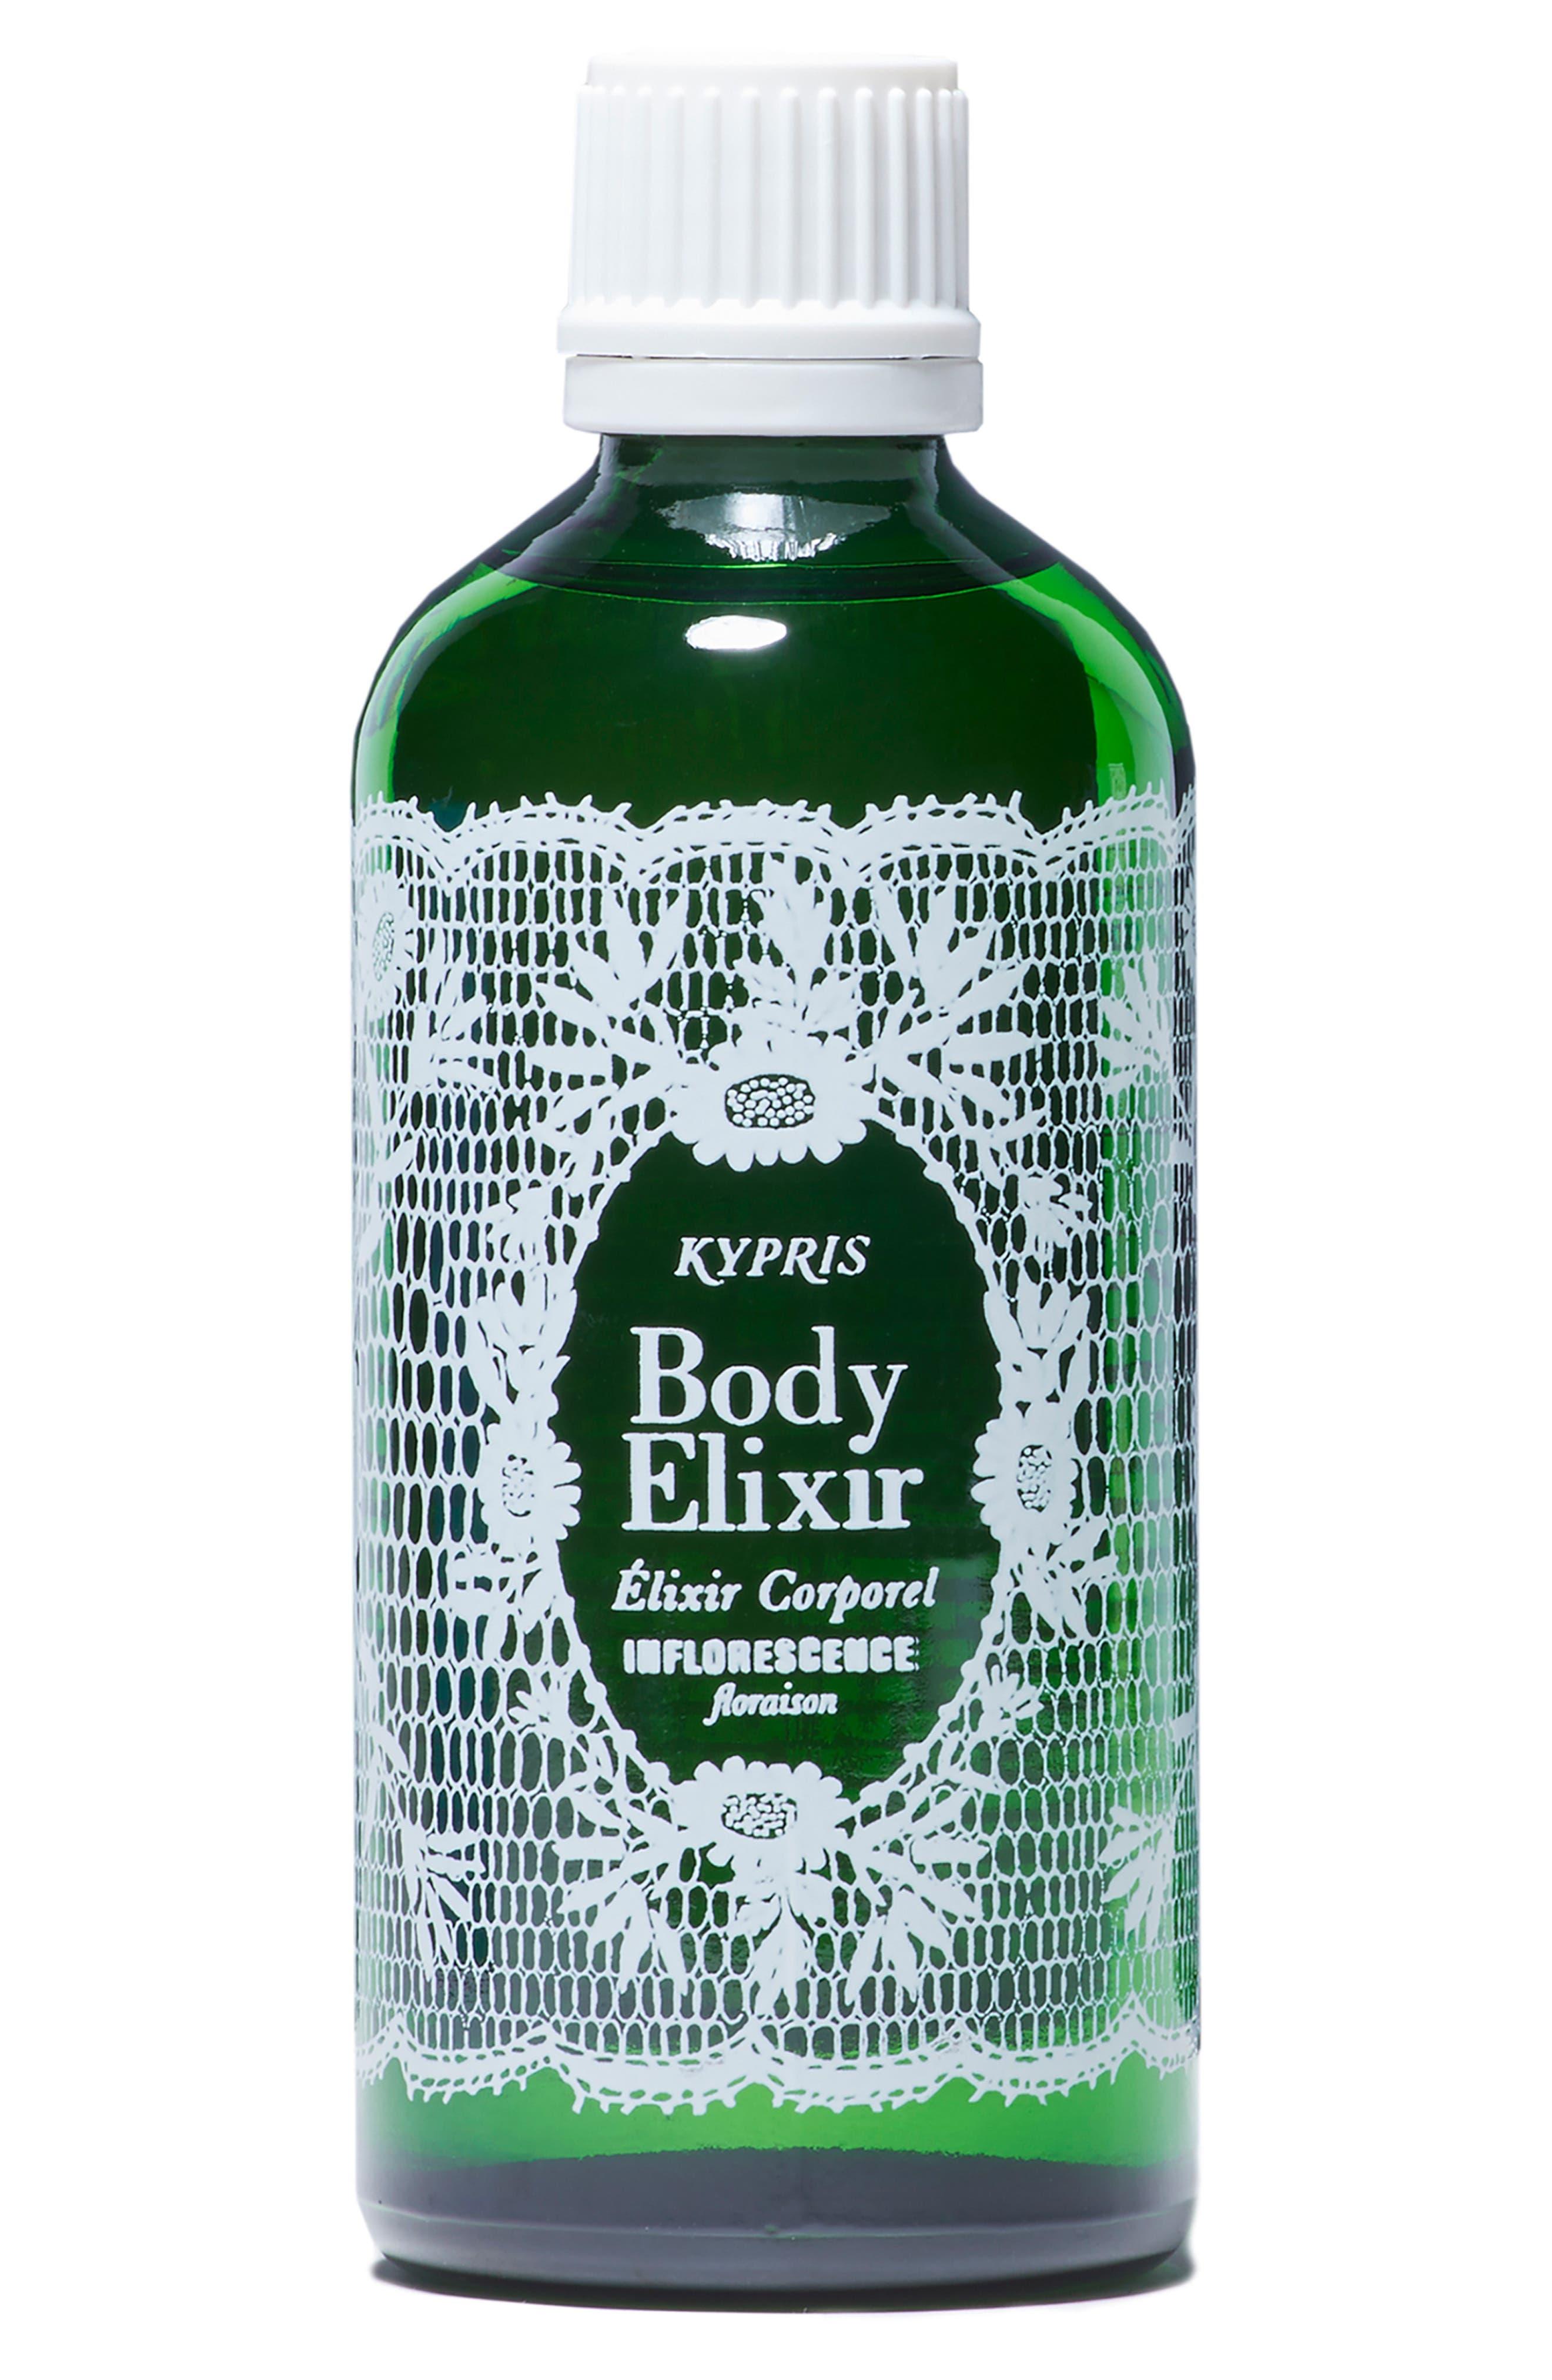 Body Elixir: Inflorescence Body Oil